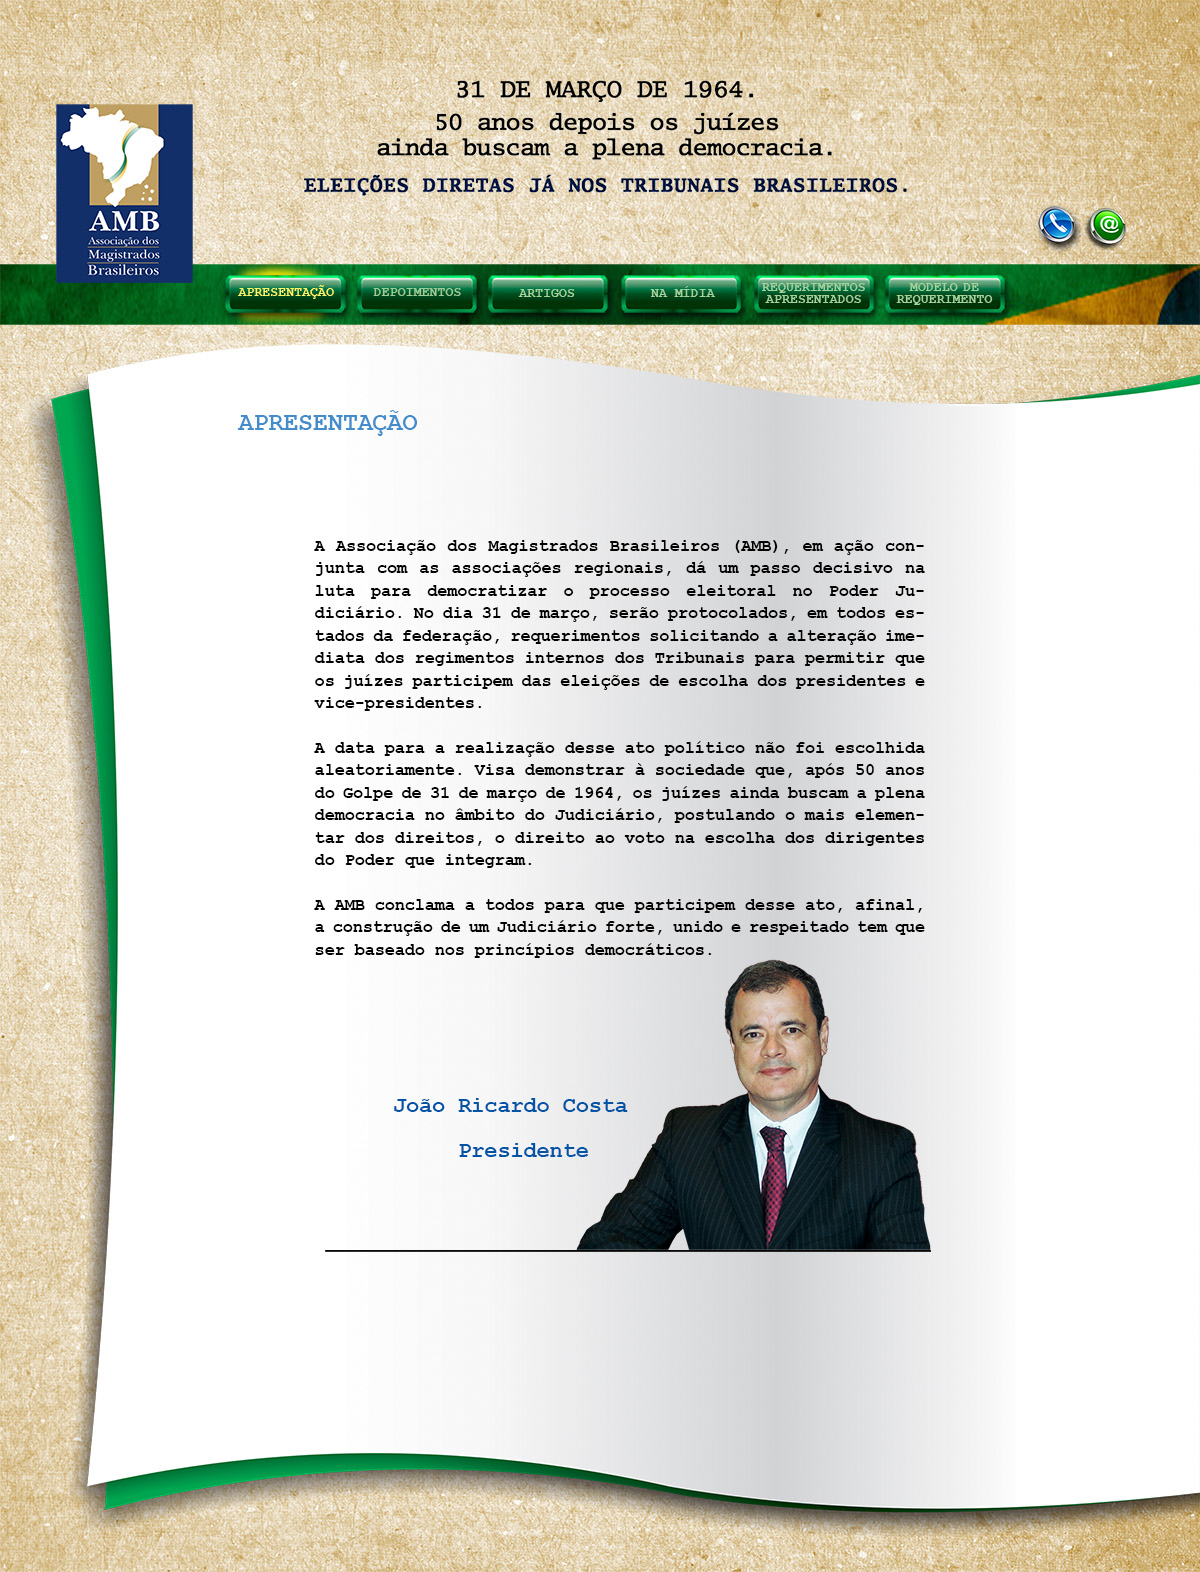 Hotsite_Eleicoes_Diretas_AMB